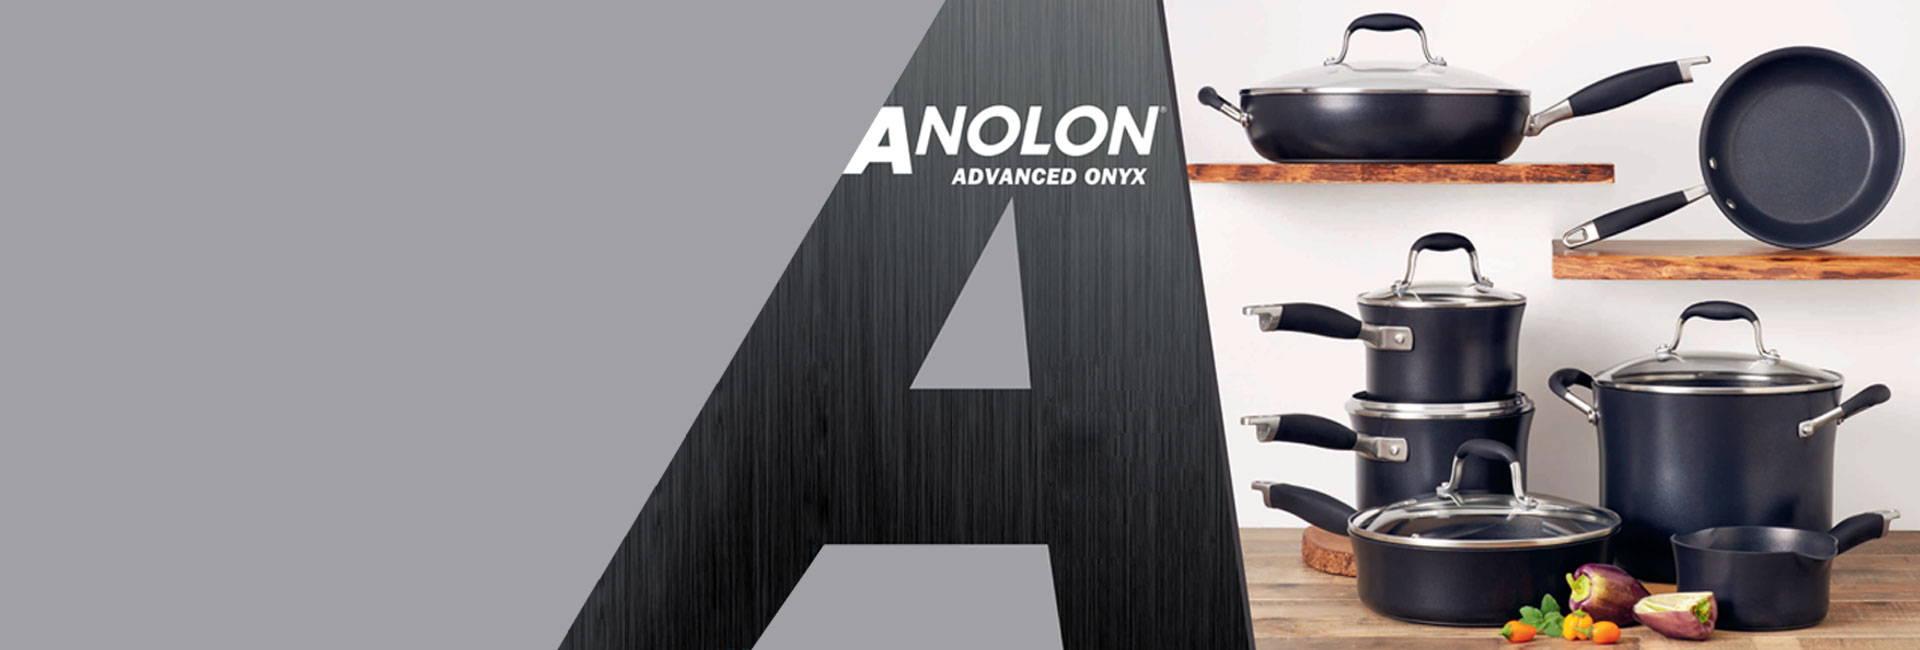 anolon advanced onyx